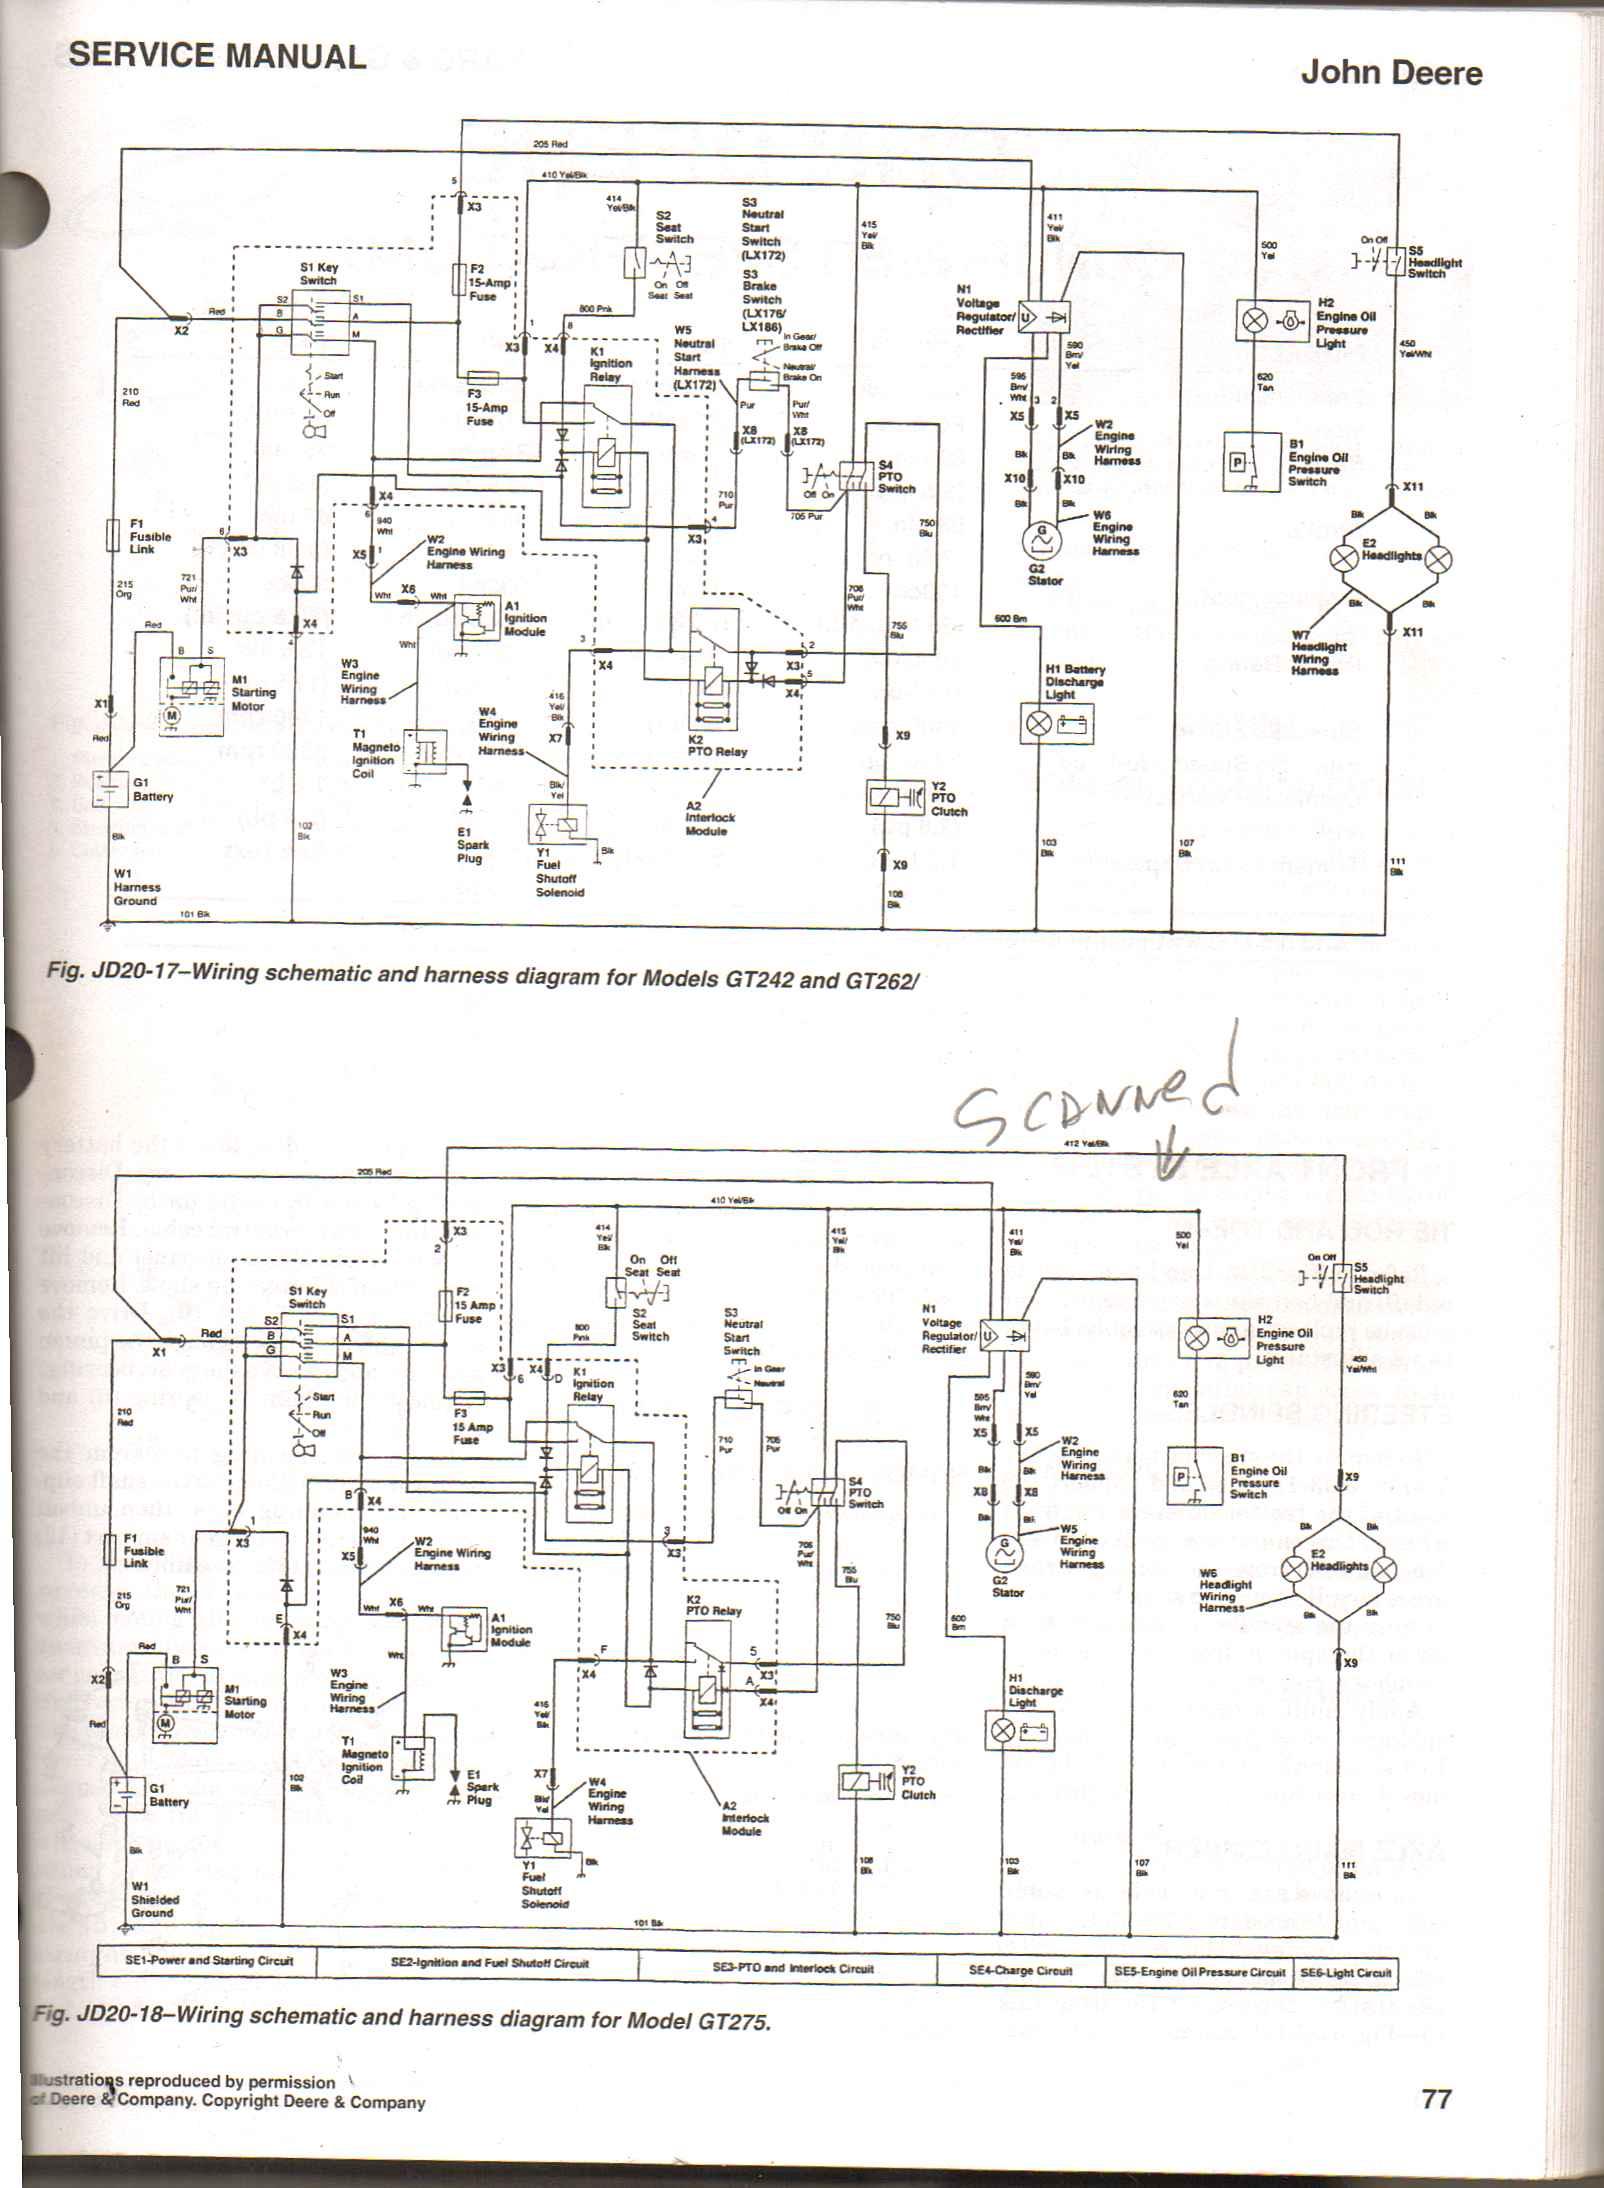 Honda Rebel Cmx250c Wiring Diagram furthermore Vf500f Coil Wiring Diagram additionally Honda Rebel Cmx250c Wiring Diagram together with Rebel Dune Buggy Wiring Harness also On A 1986 Honda Cmx450 Wiring Diagram. on on a 1986 honda cmx450 wiring diagram